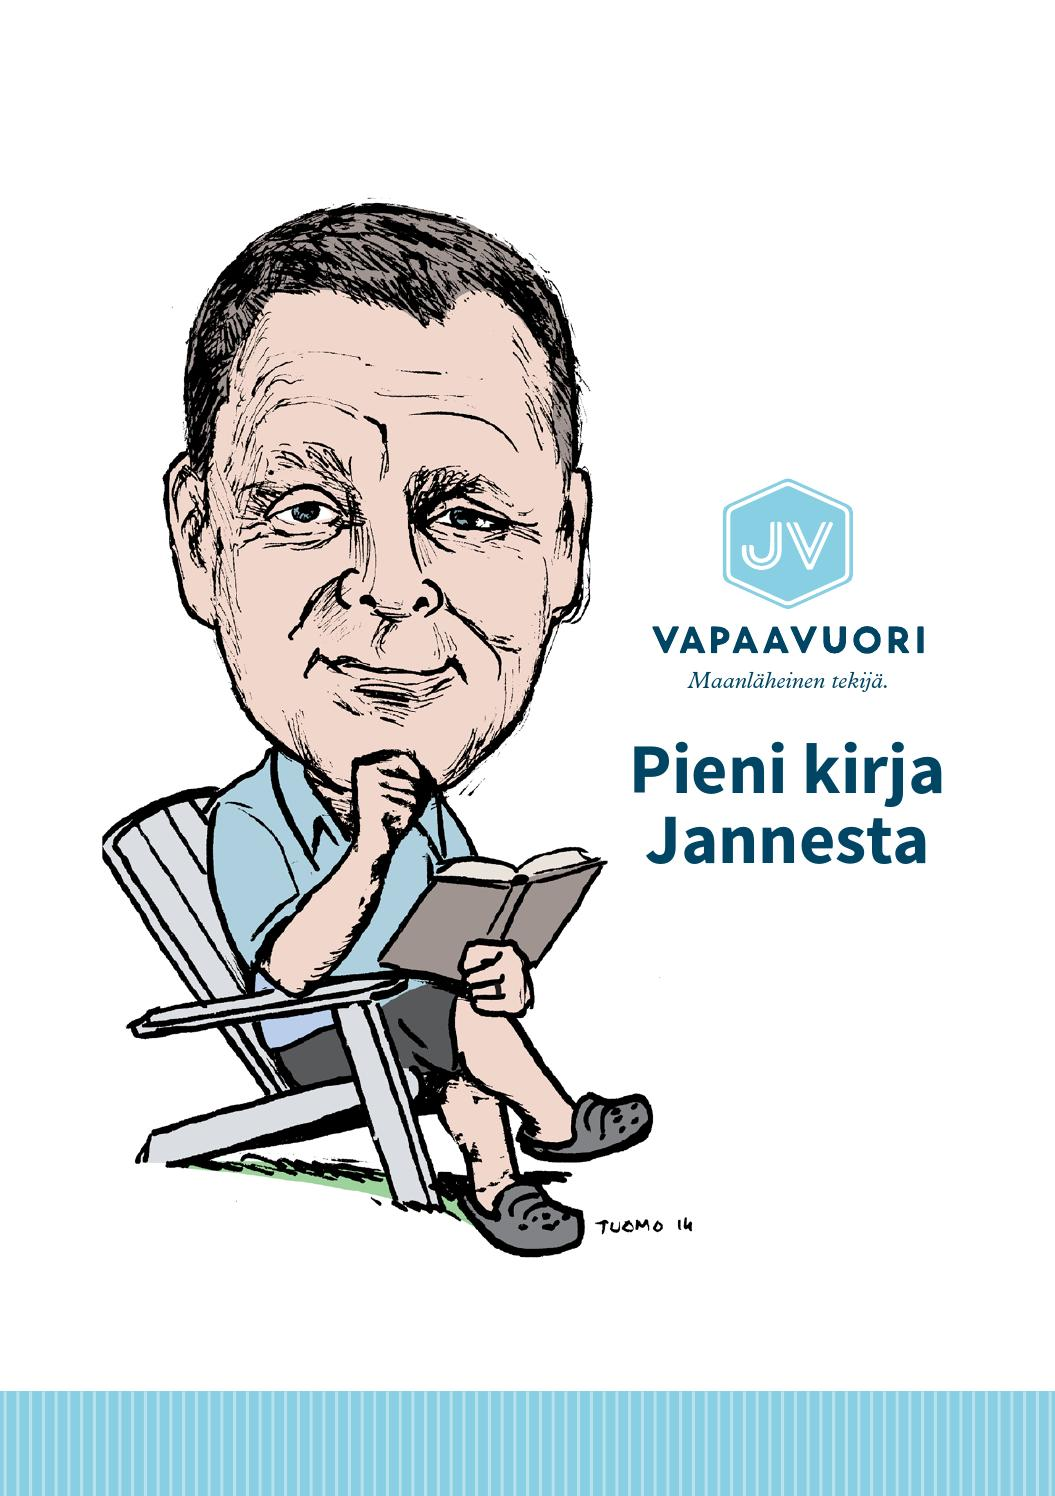 Pieni kirja Jannesta by Vapaavuori  issuu